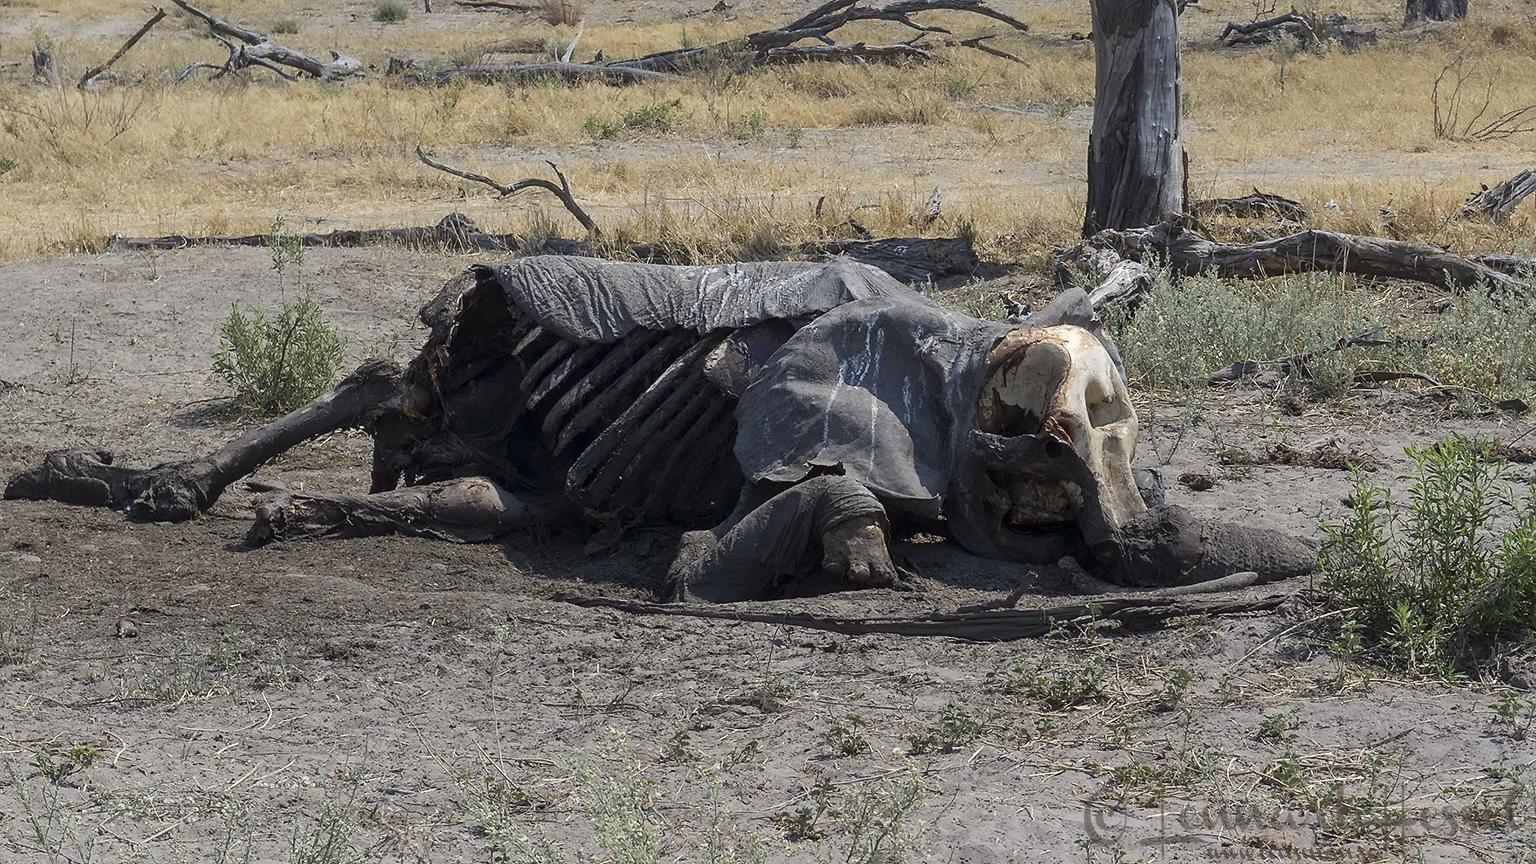 Dead Elephant in Khwai Community Area, Botswana